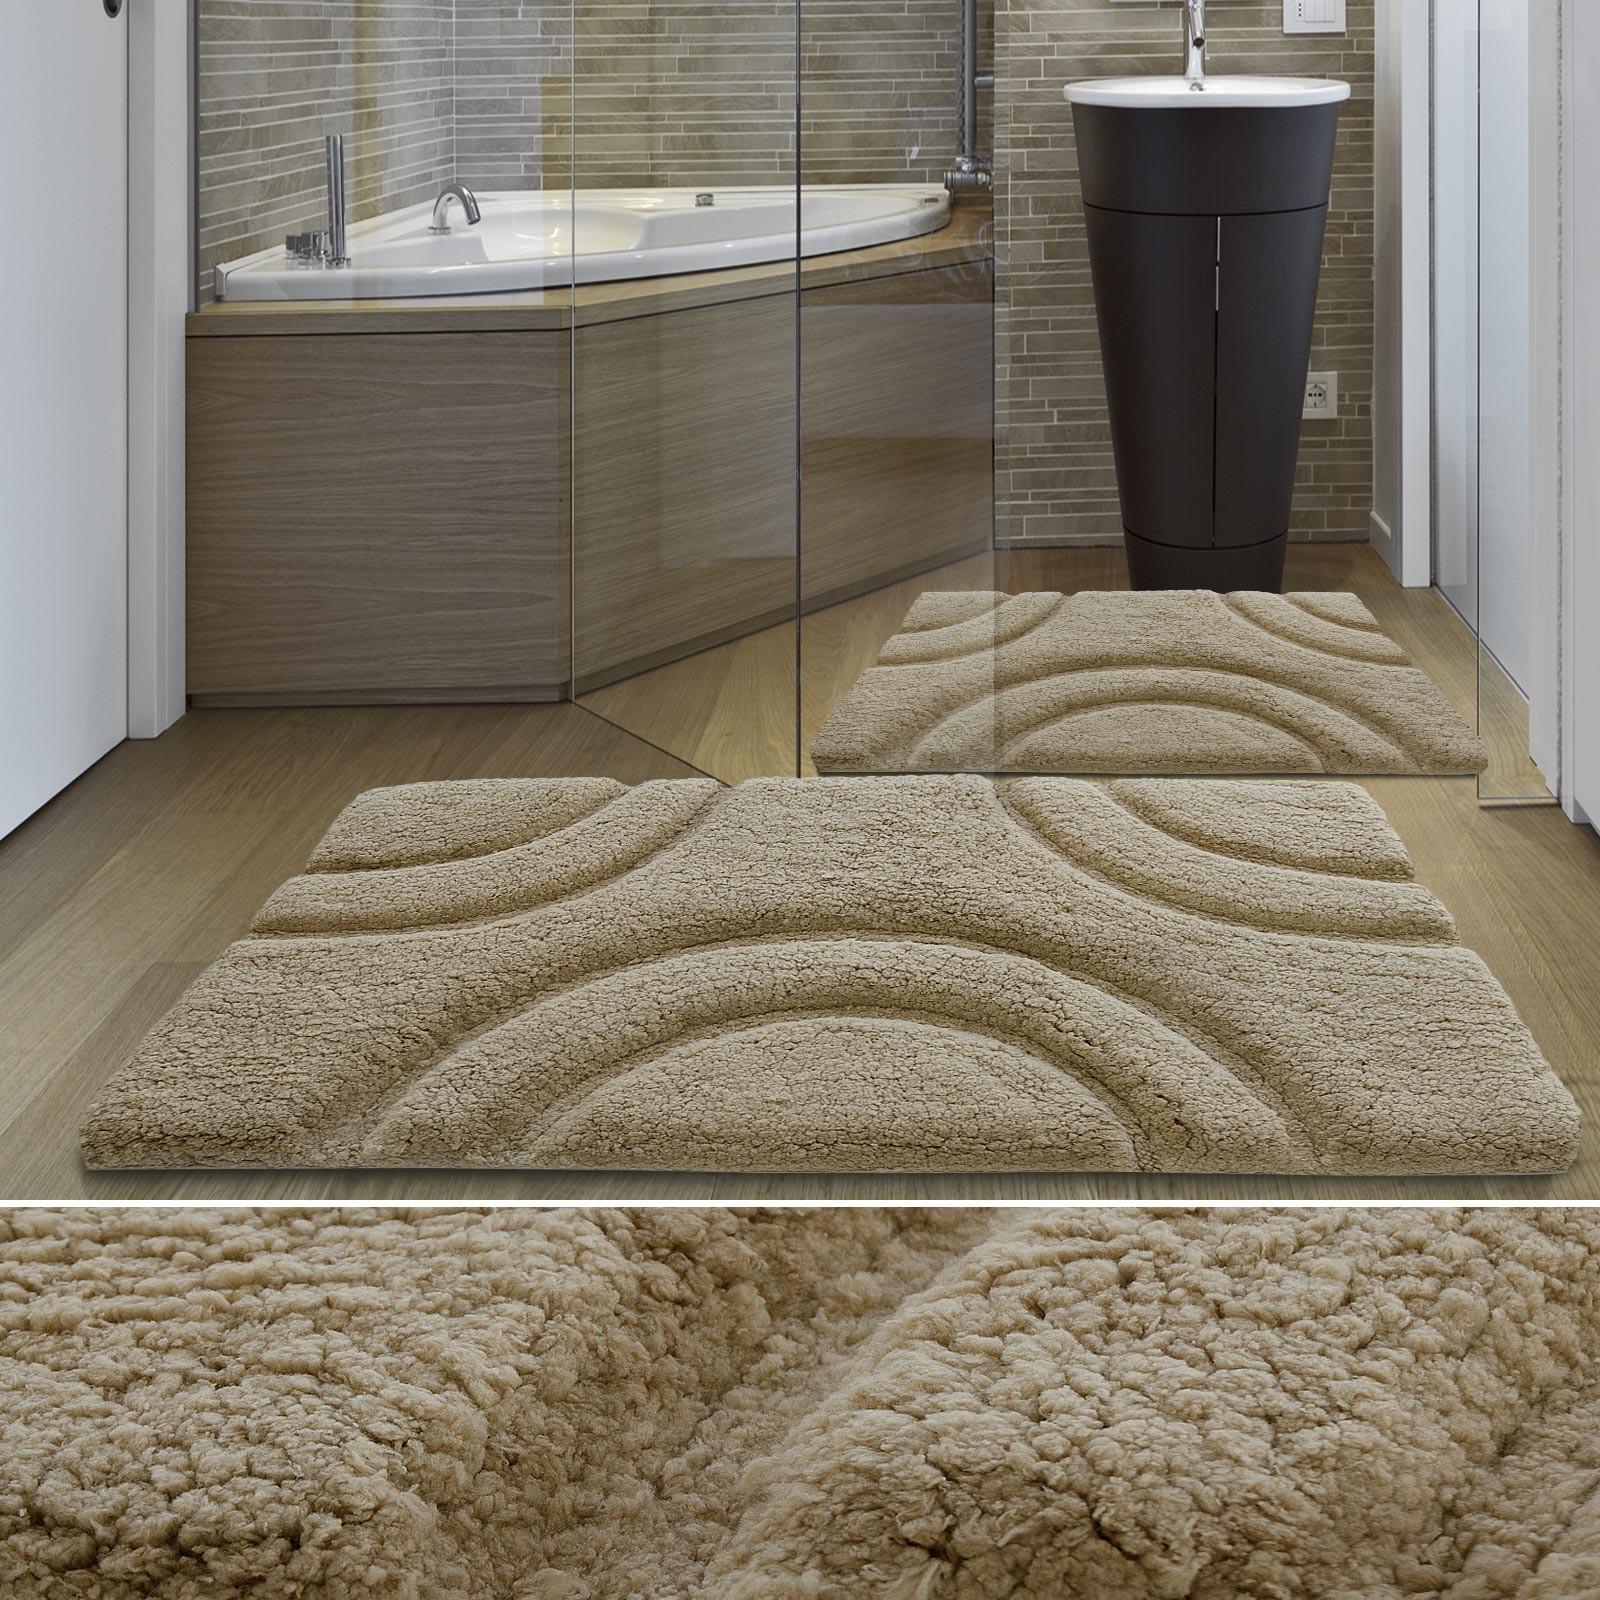 tapis salle de bain antidérapant